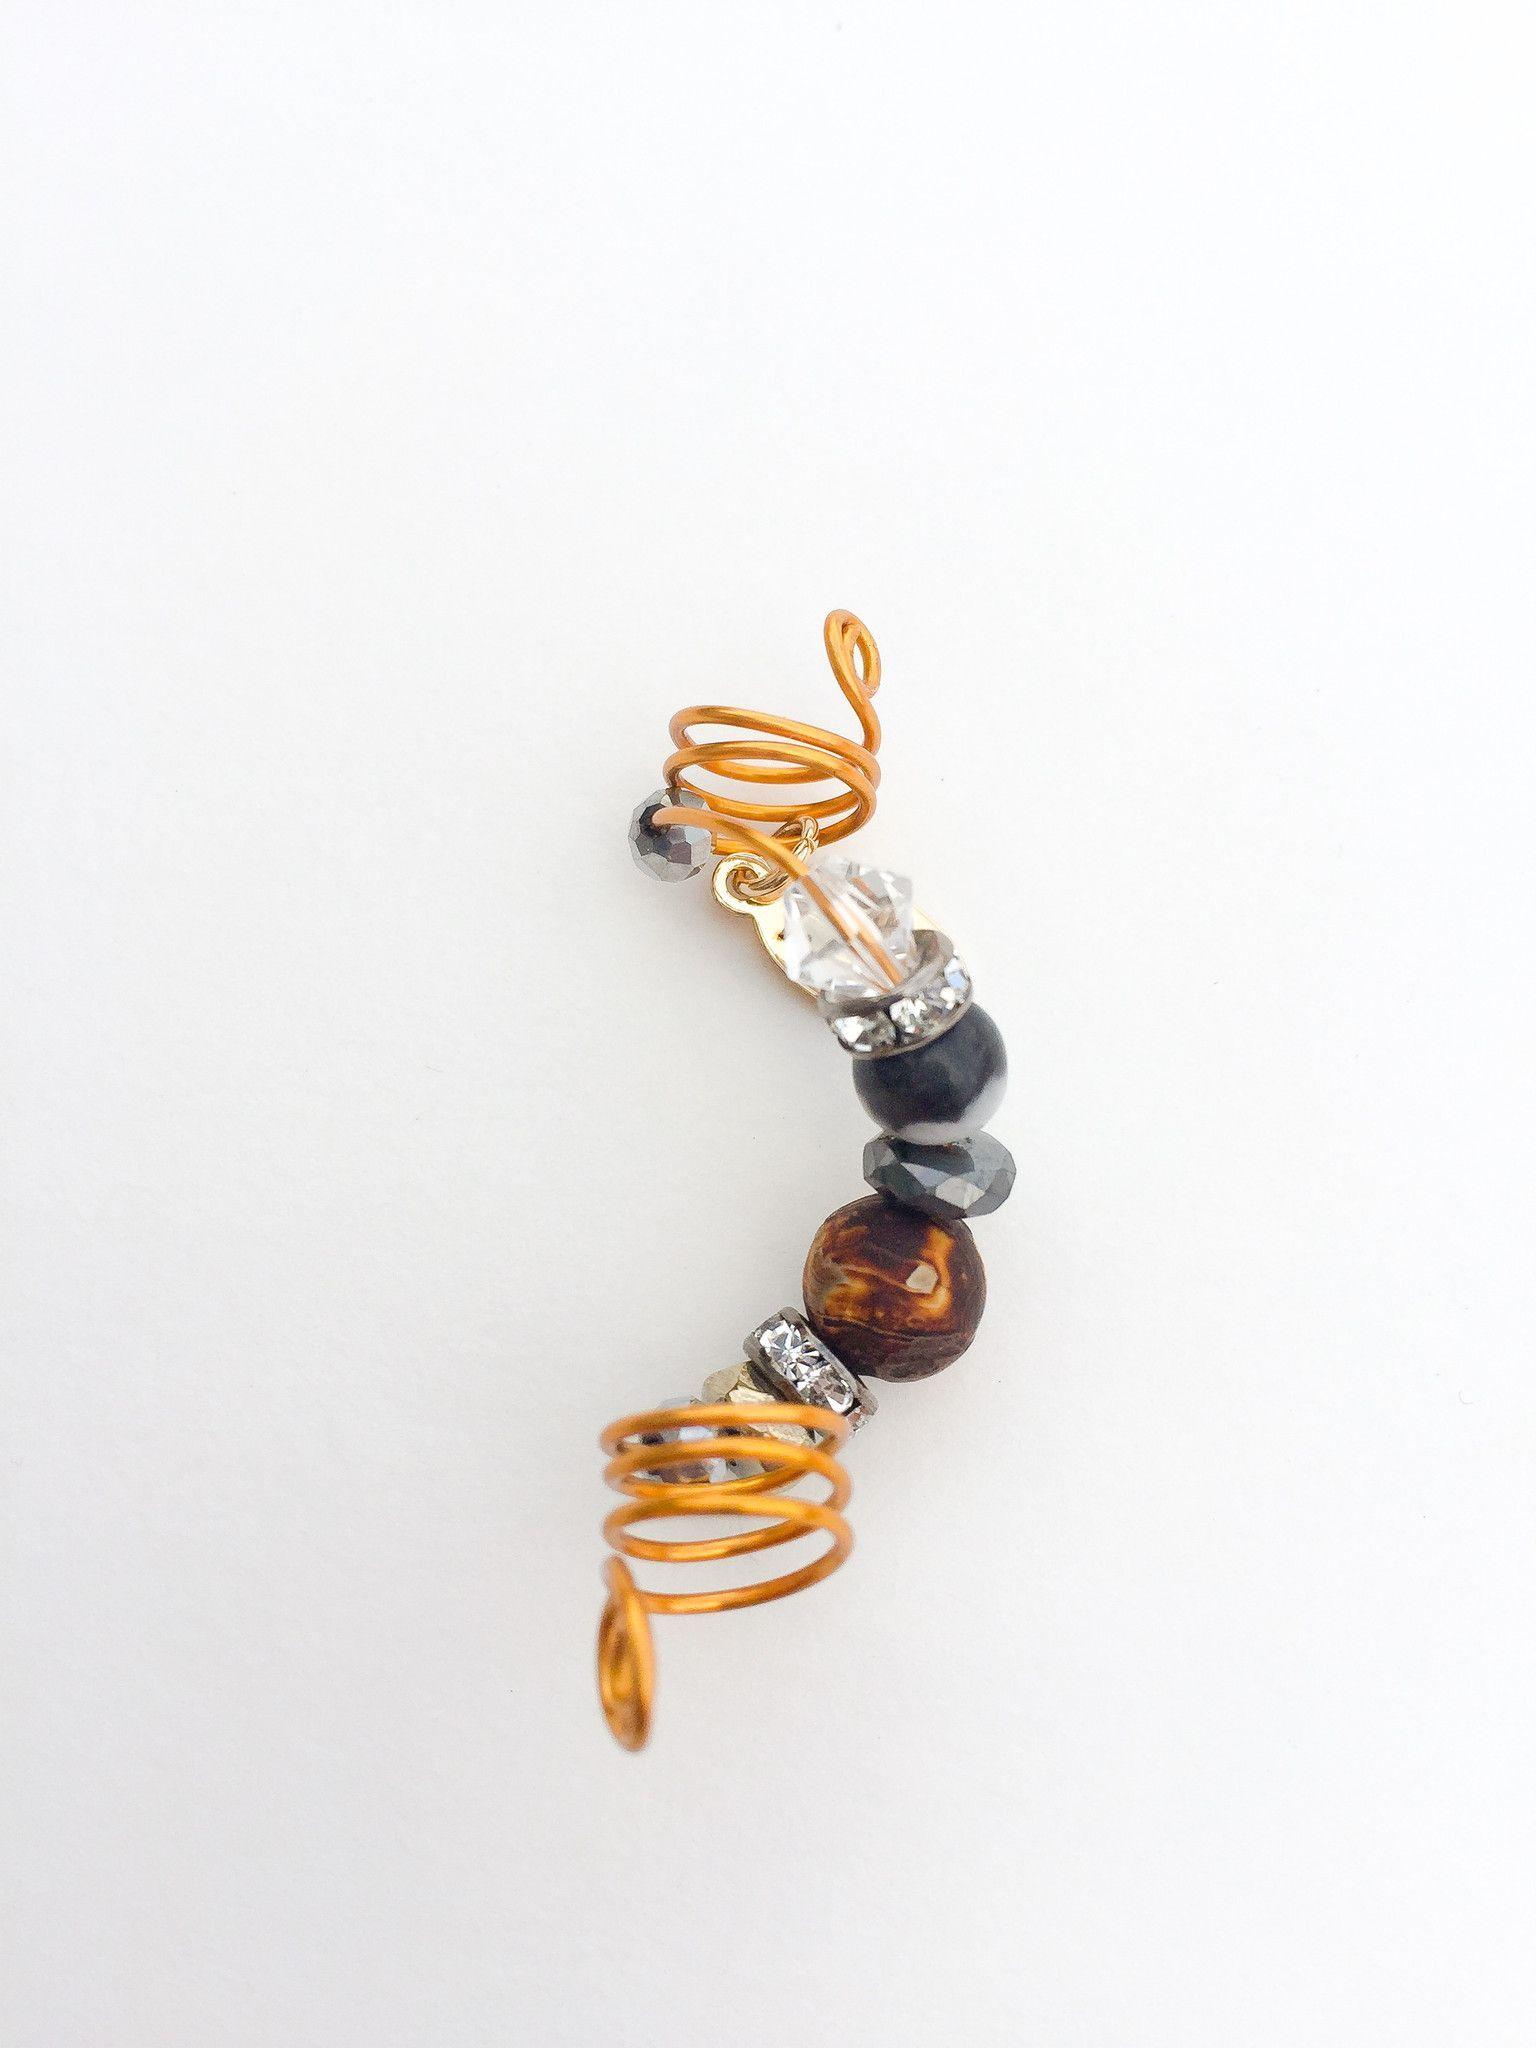 SANDDUNE Wood Fired Tibetan Agate Loc Jewel